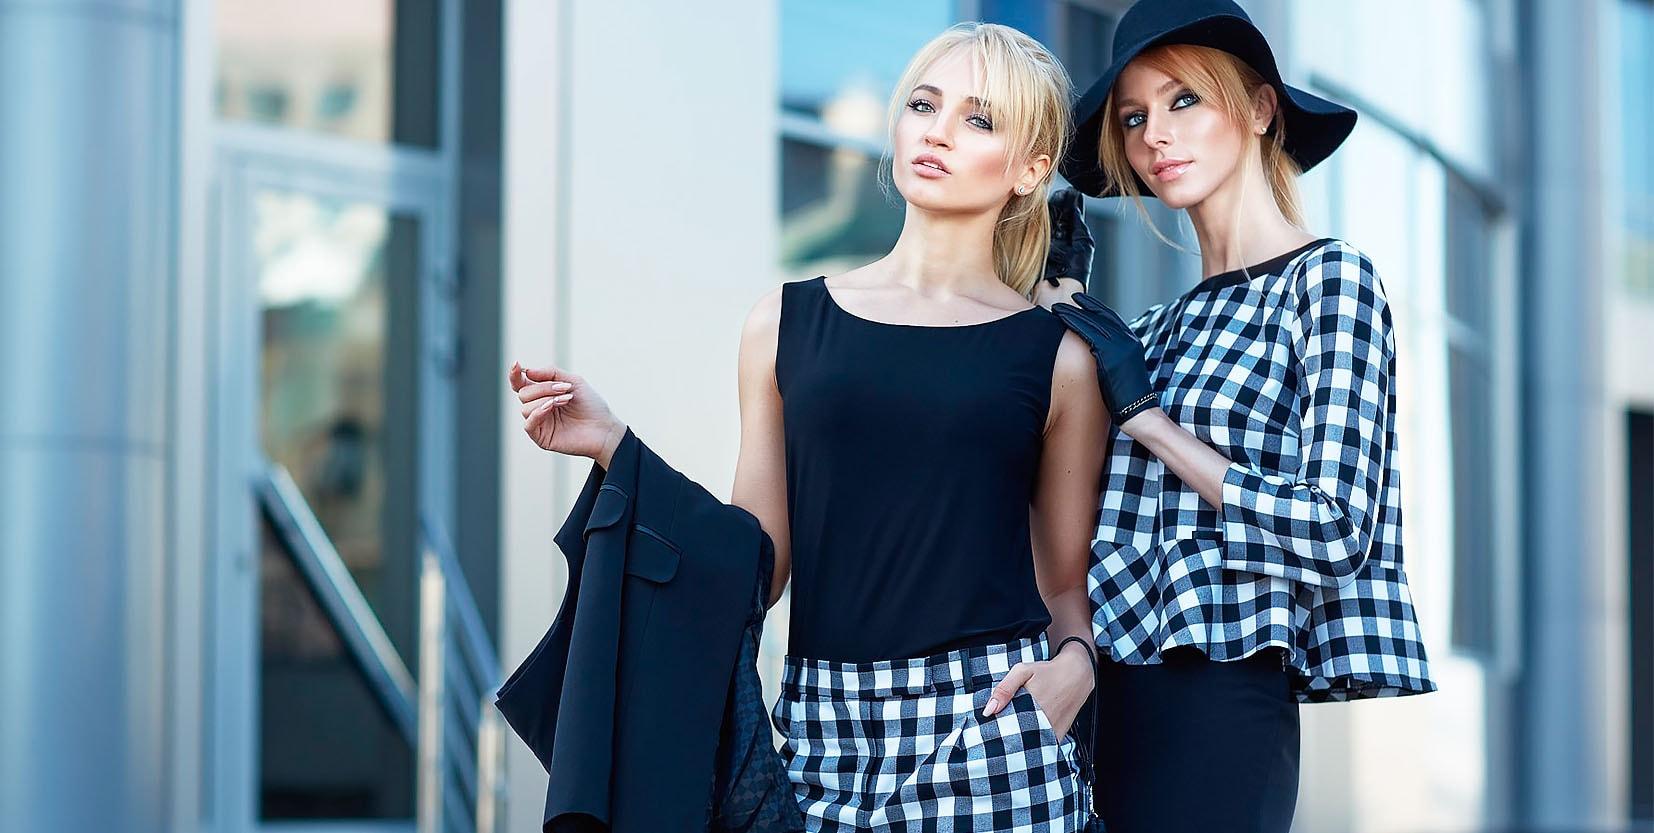 Особенности стиля casual мода